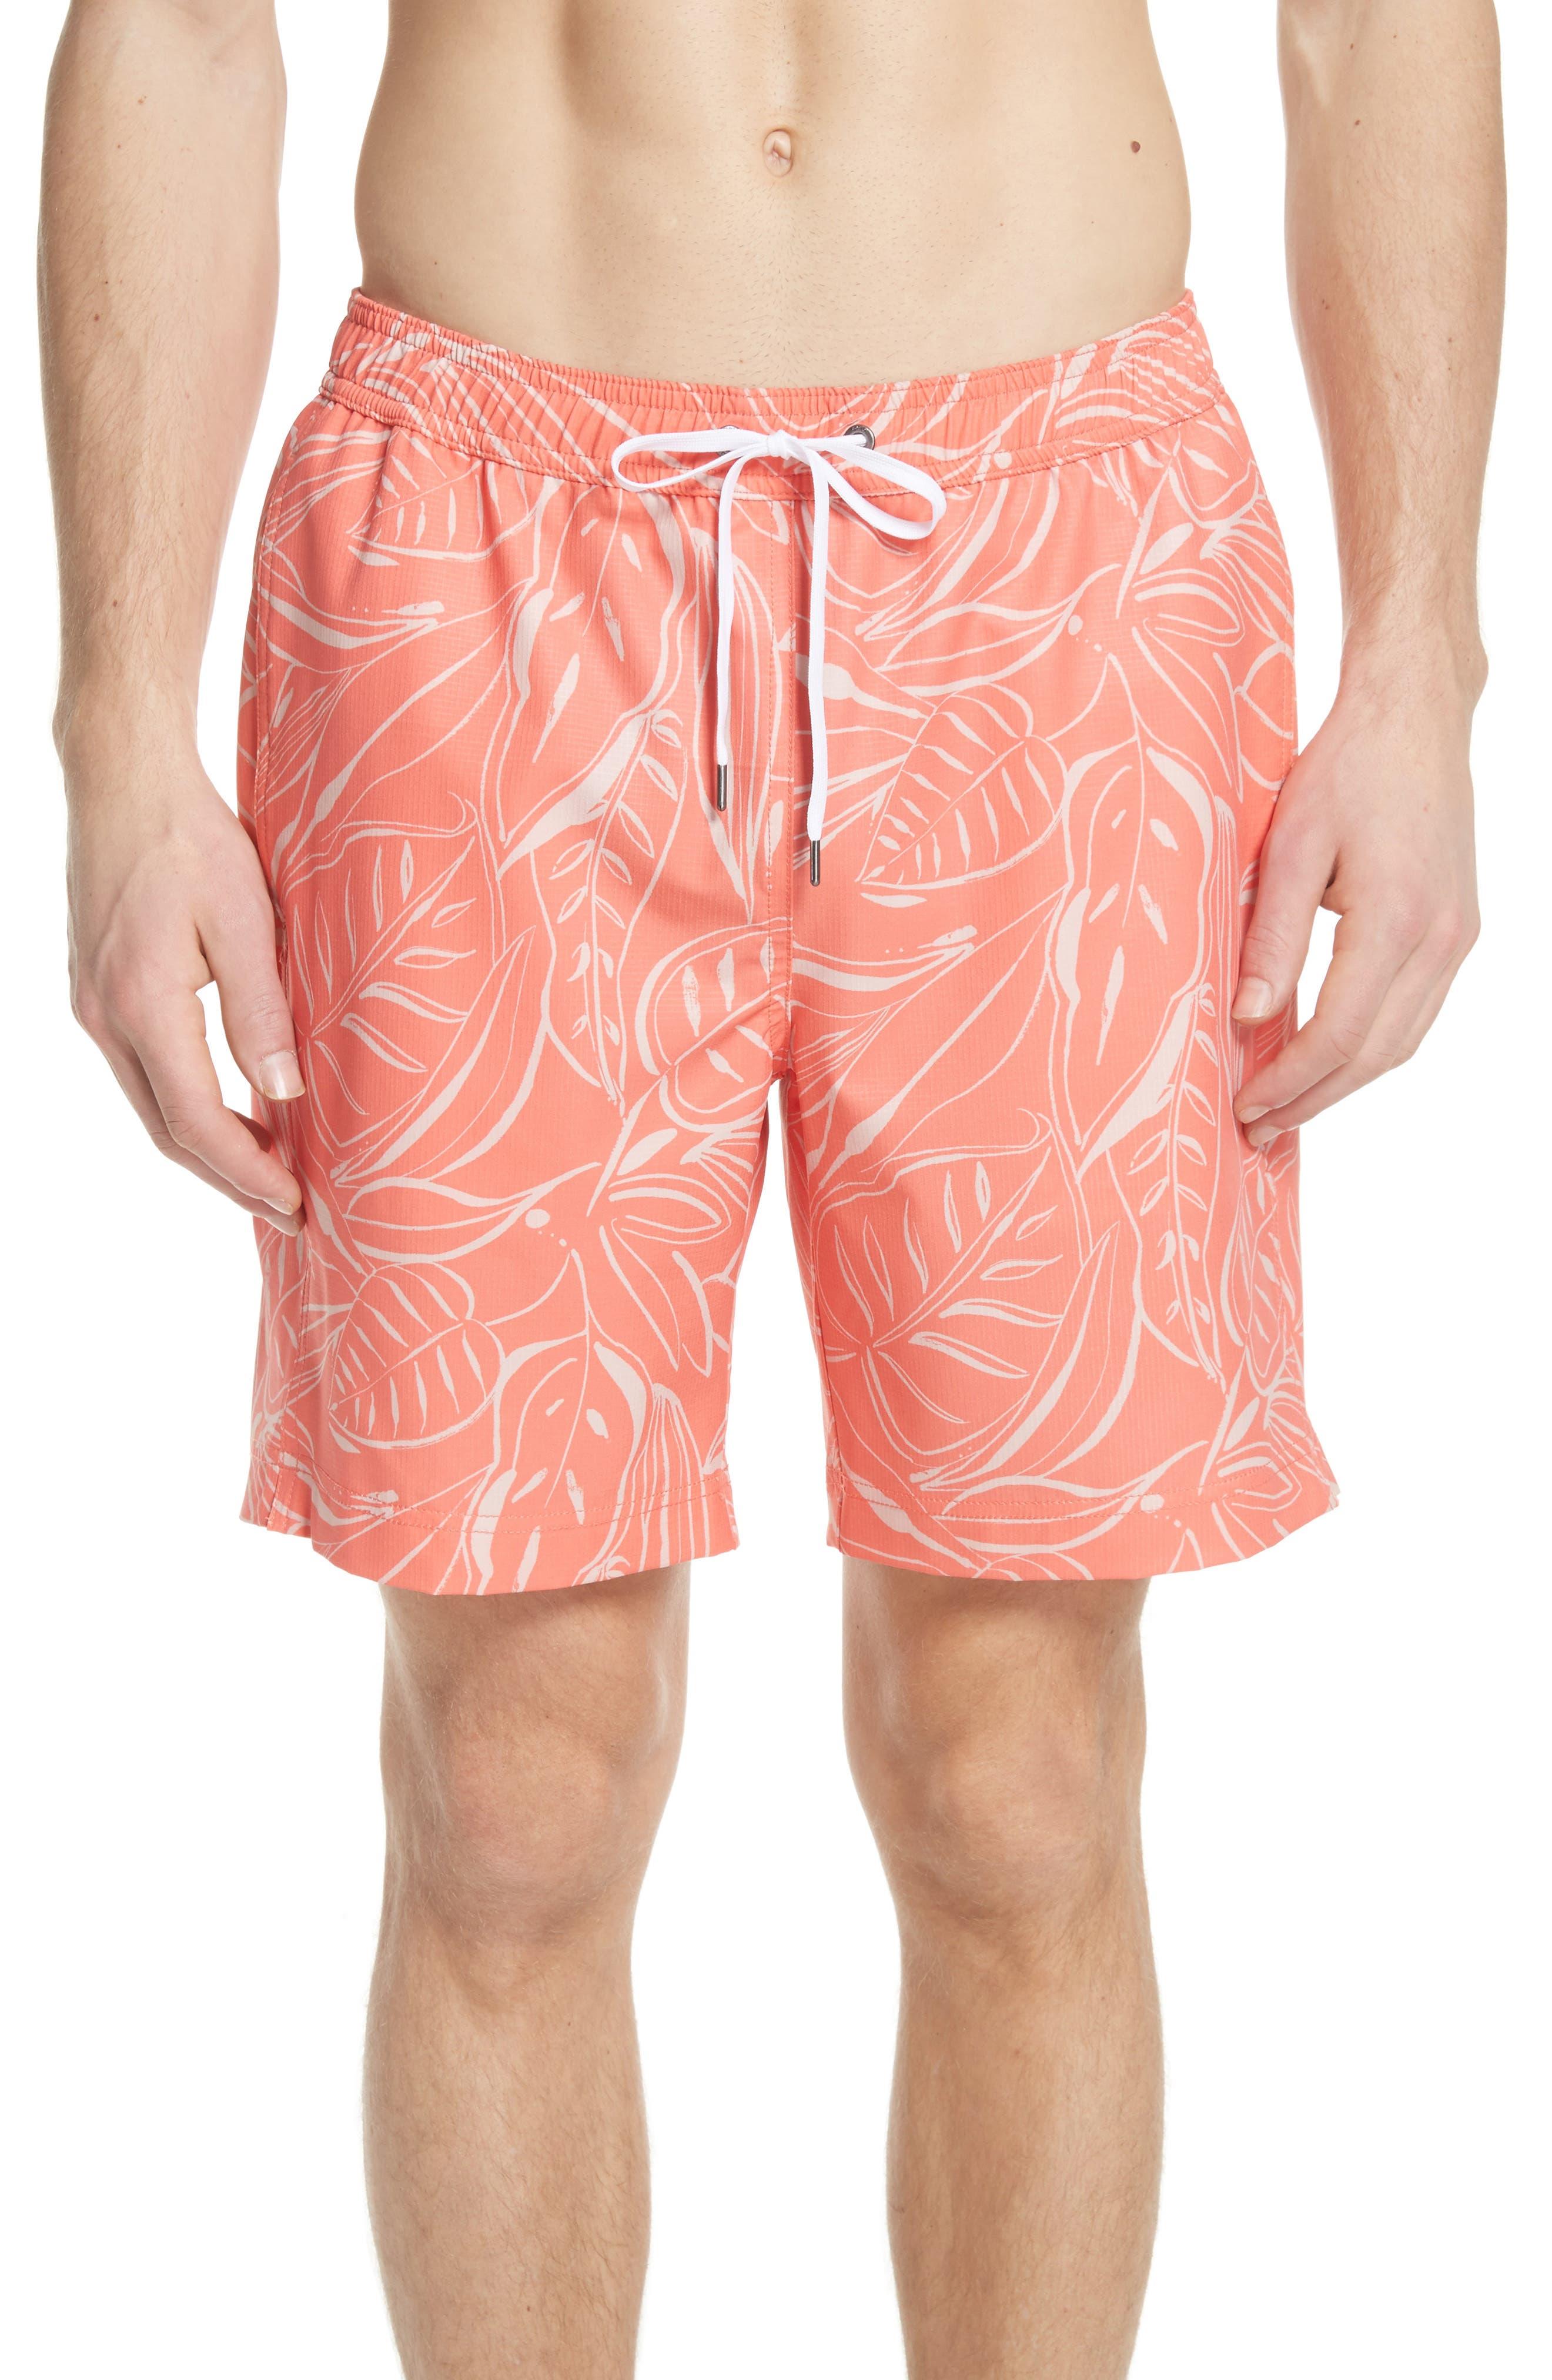 Charles Leaf Print Swim Trunks,                         Main,                         color, Tangerine Coral